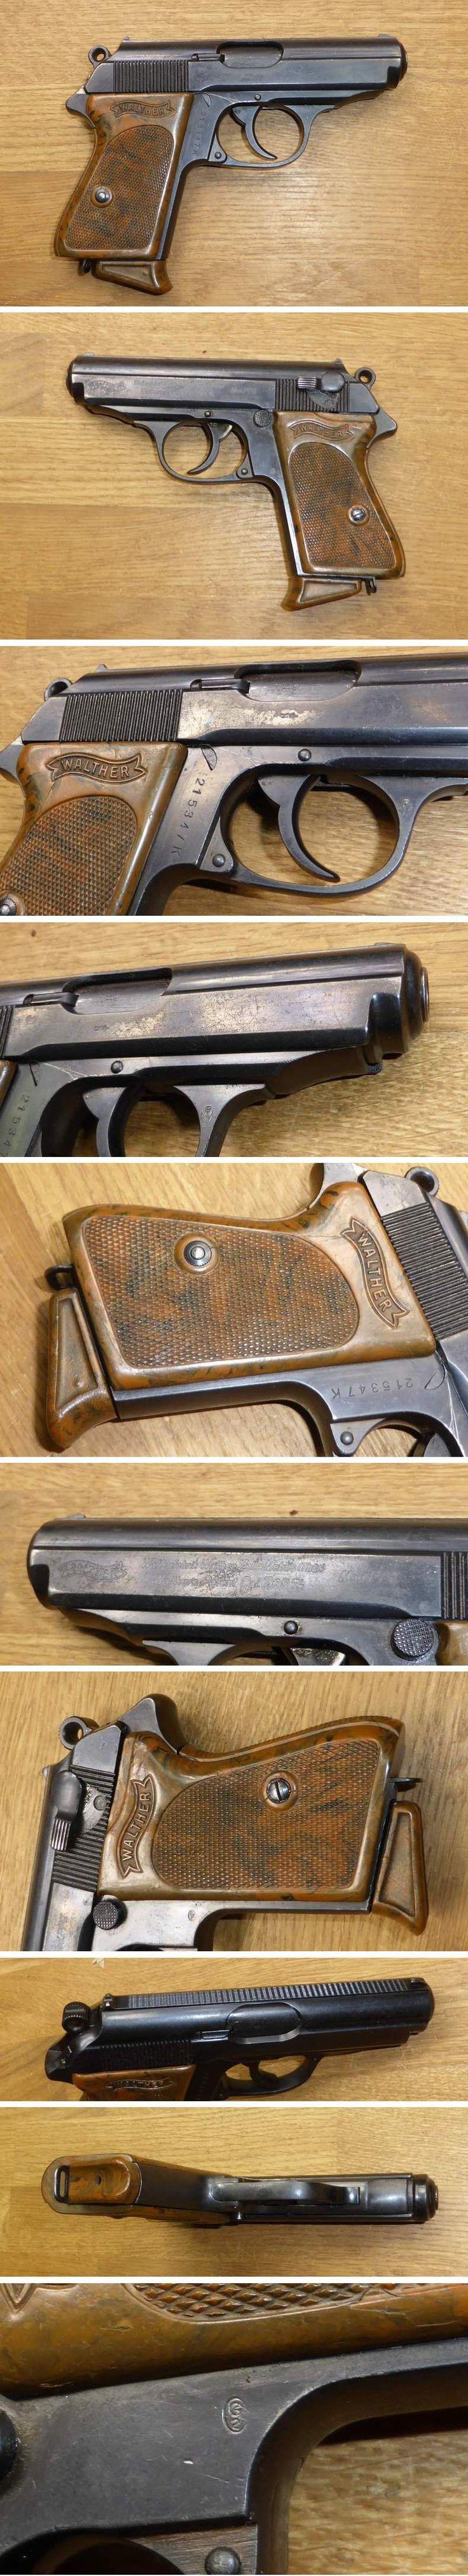 "BROŃ PALNA - PISTOLETY - Walther PPK kal. 7,65mmBr ""G2"" - Find our speedloader now!  http://www.amazon.com/shops/raeind"